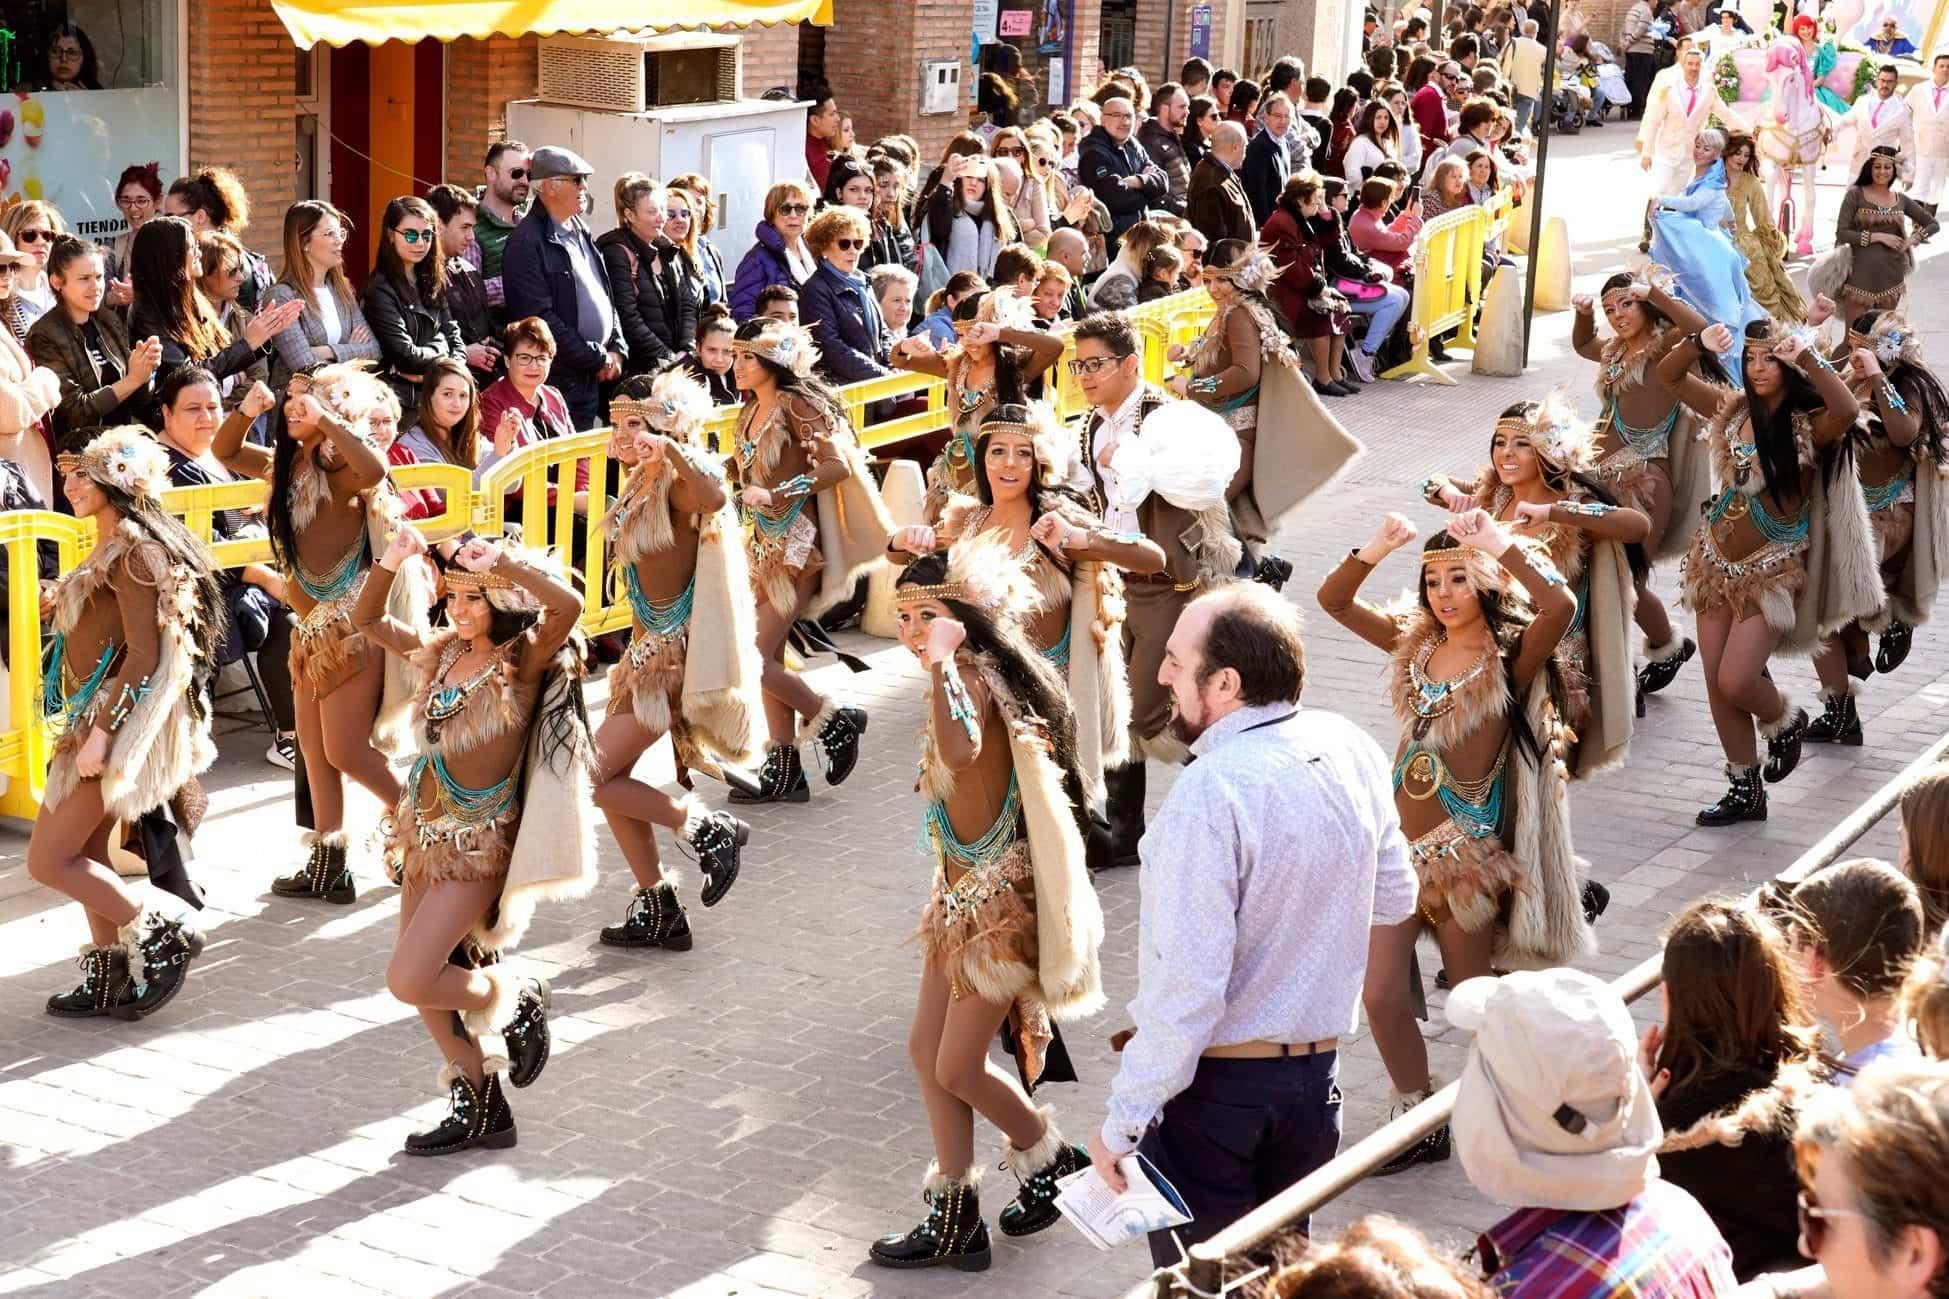 Carnaval de herencia 2020 ofertorio 123 - Selección de fotografías del Ofertorio del Carnaval de Herencia